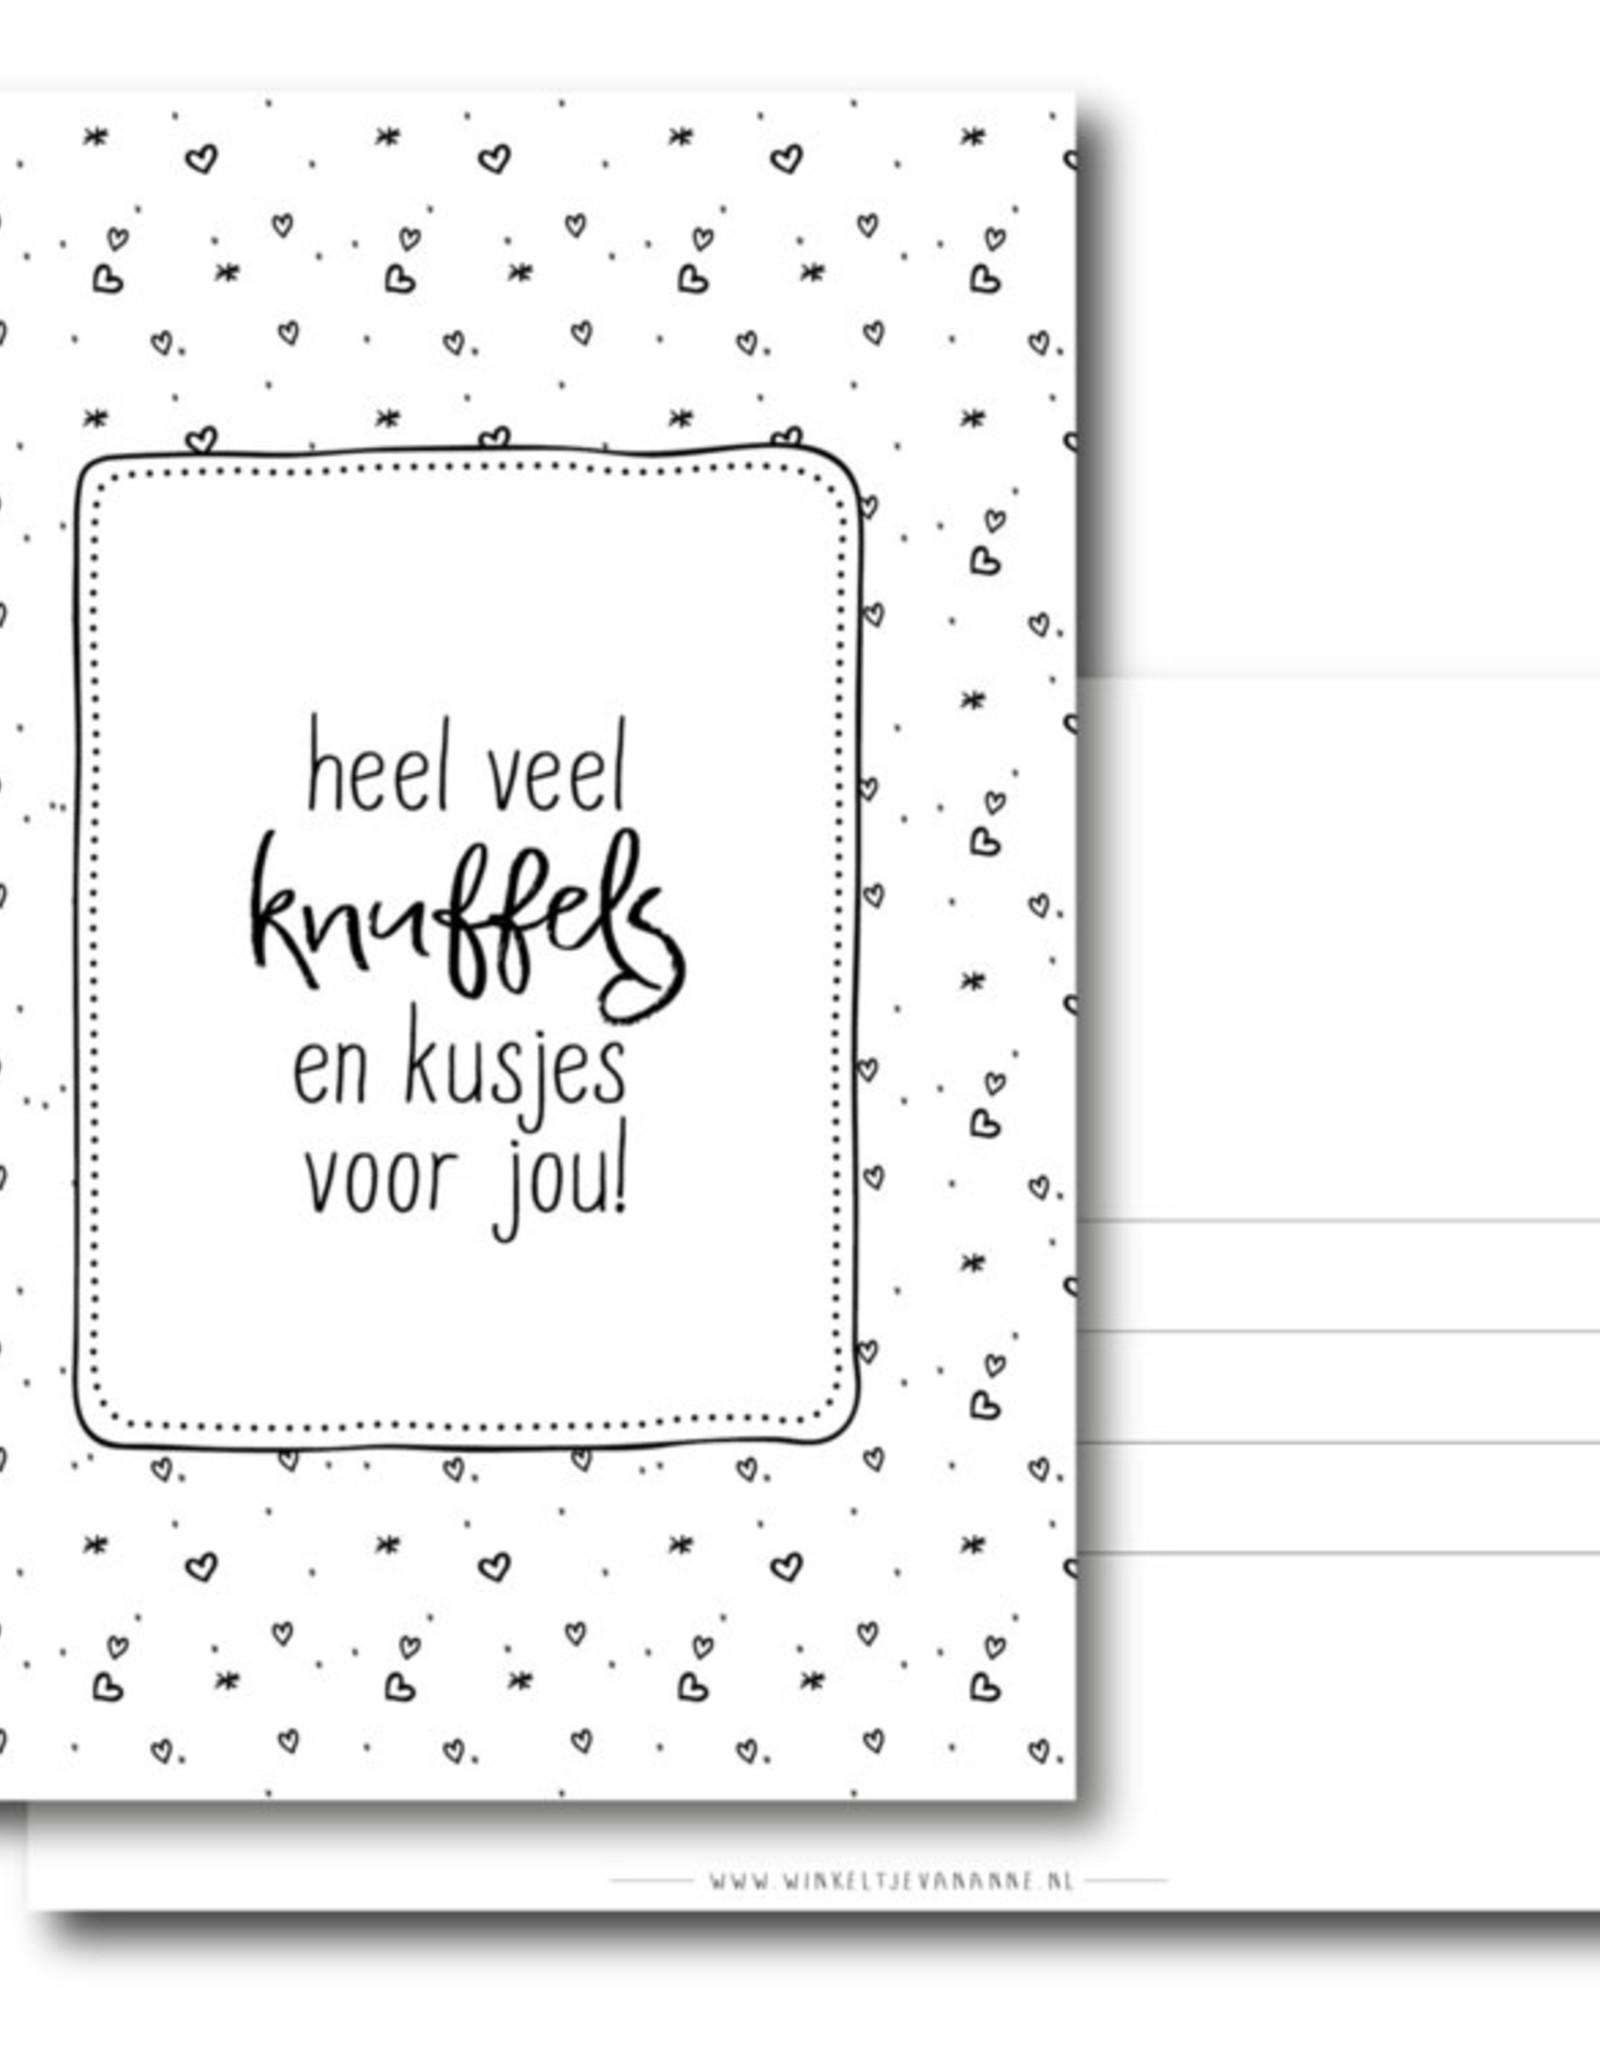 Winkeltje van Anne kaart a6 winkeltje van anne: heel veel knuffels en kusjes voor jou!